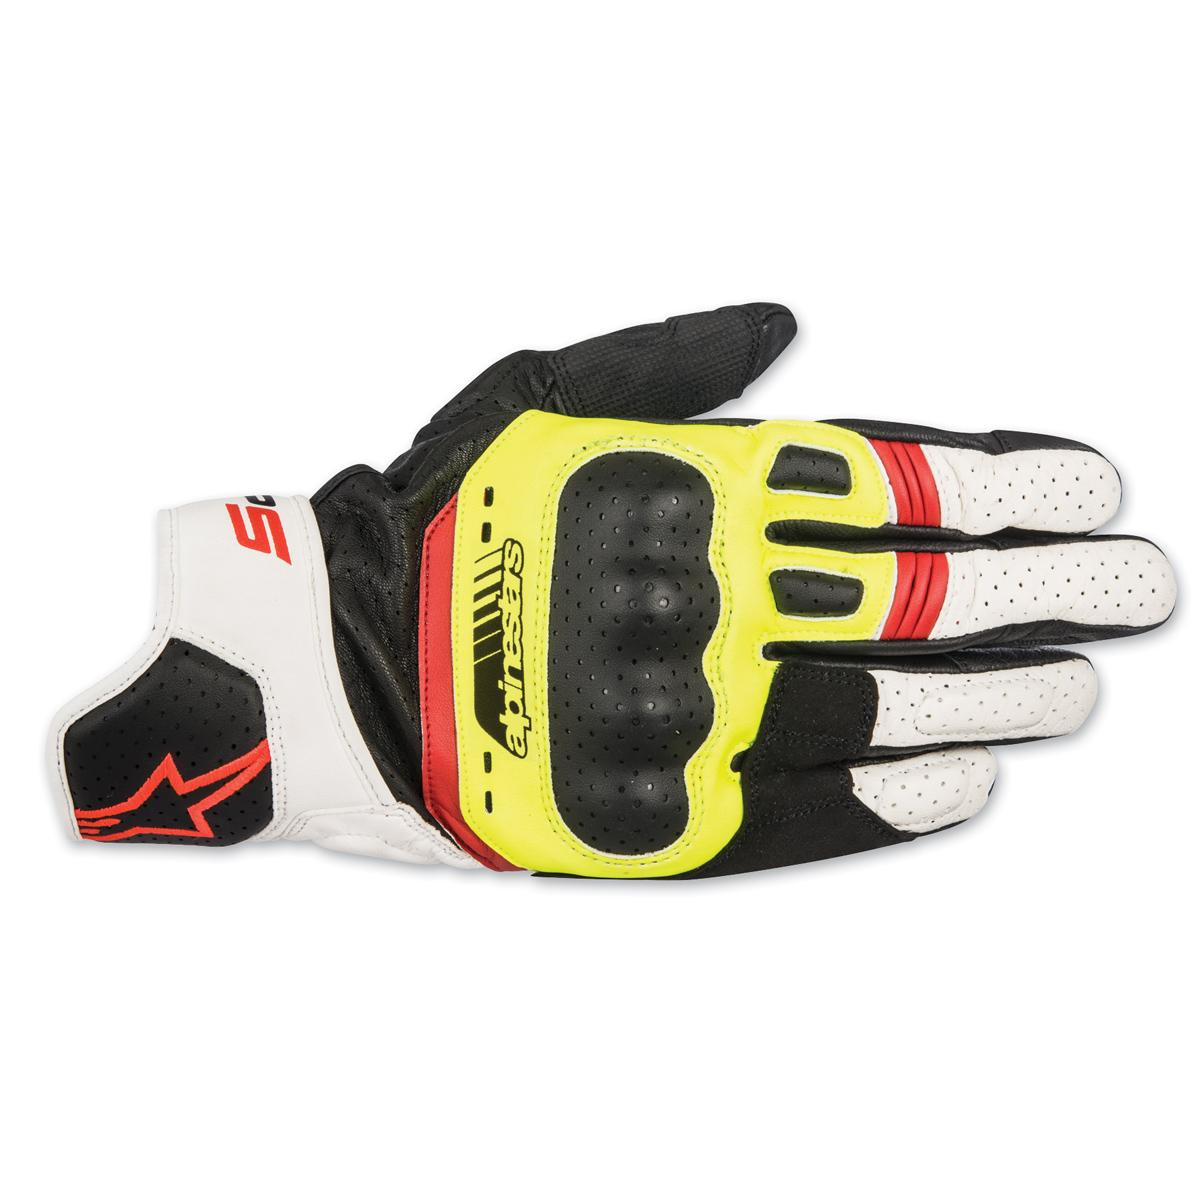 0a99d8e75a5e7 Alpinestars Men's SP-5 Black/Yellow/White/Red Leather Gloves ...